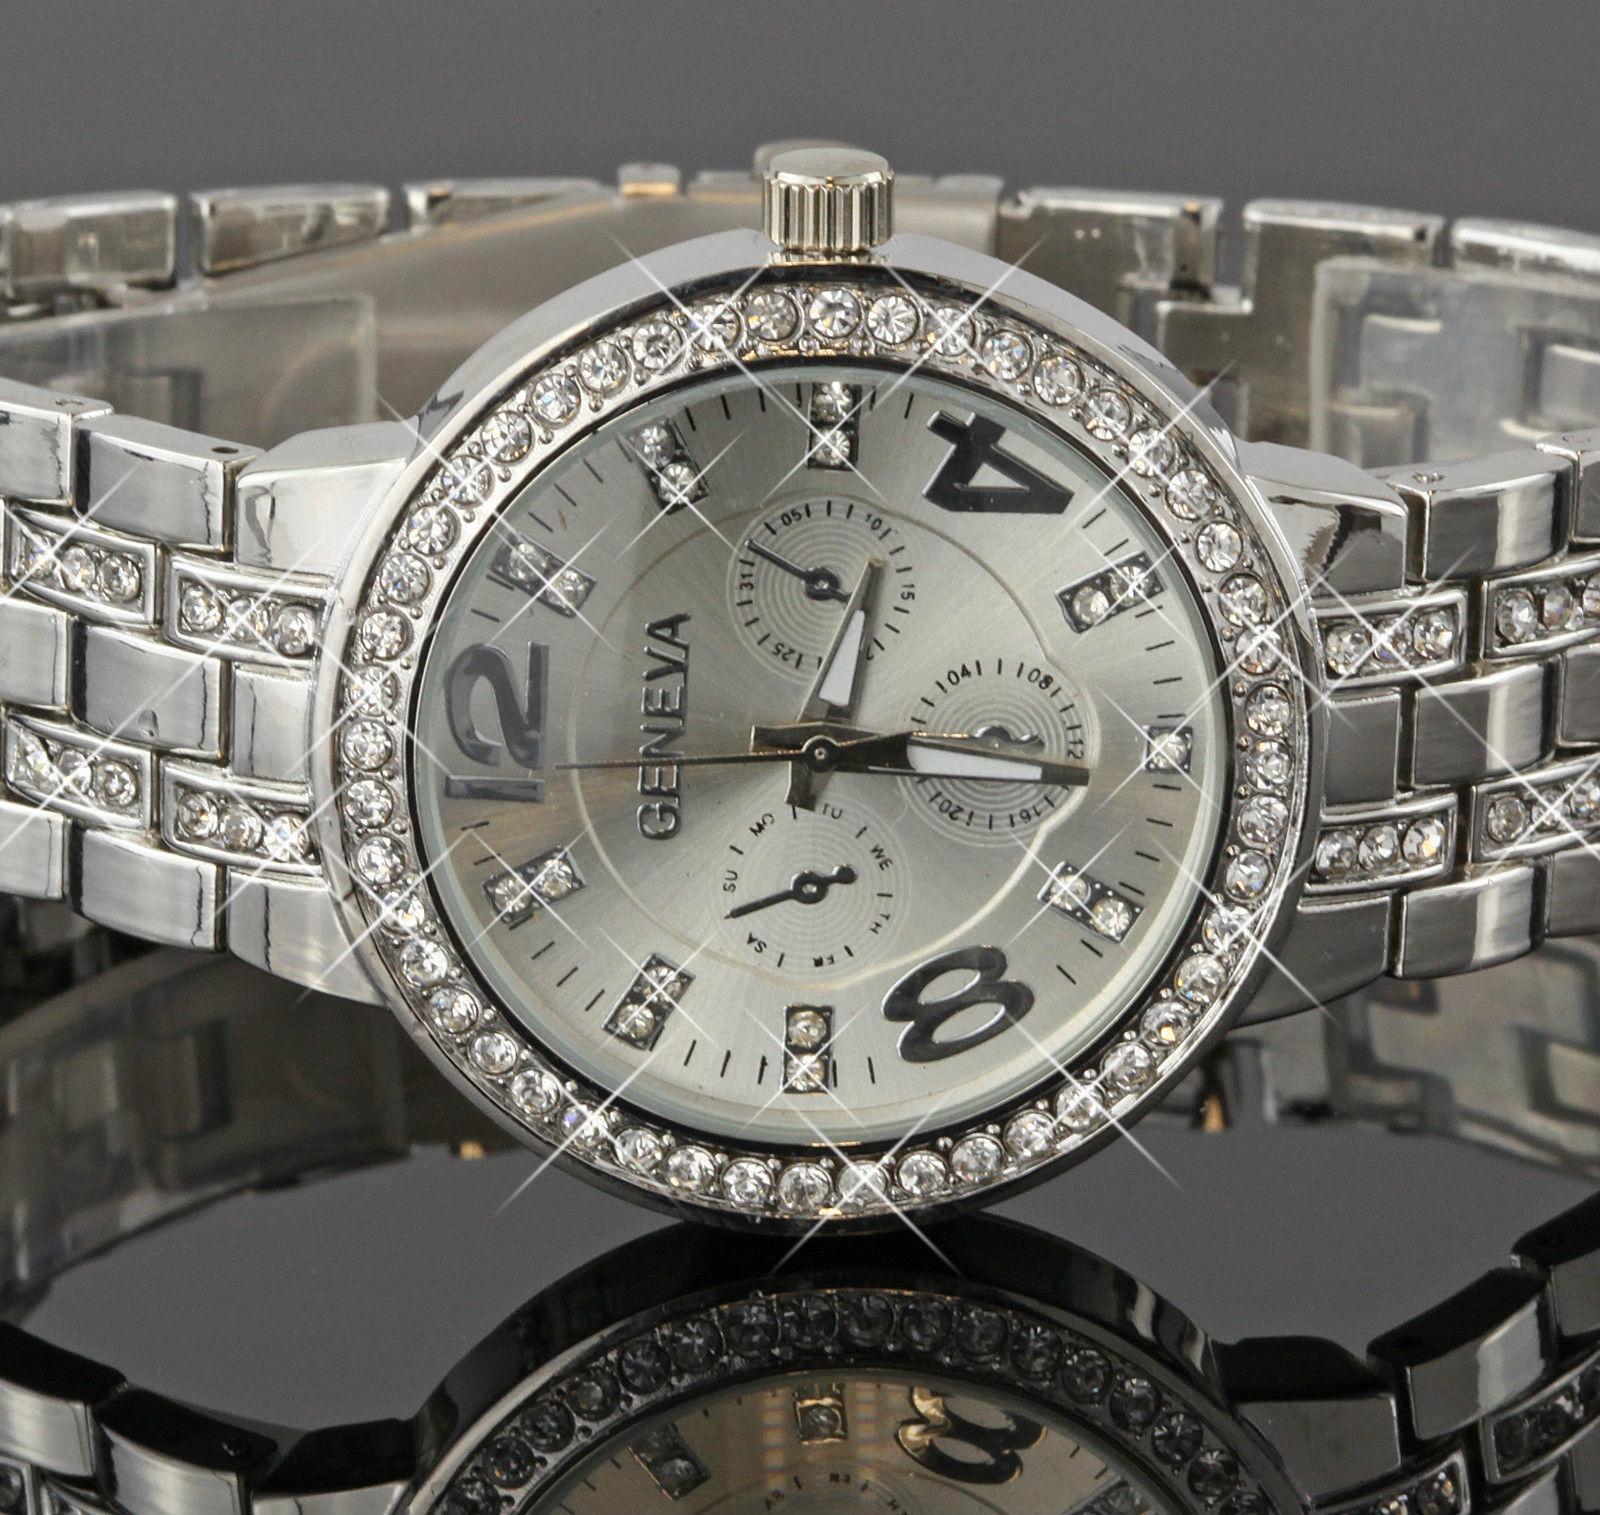 Dámske hodinky Geneva s krištáľmi strieborné empty 003038de795